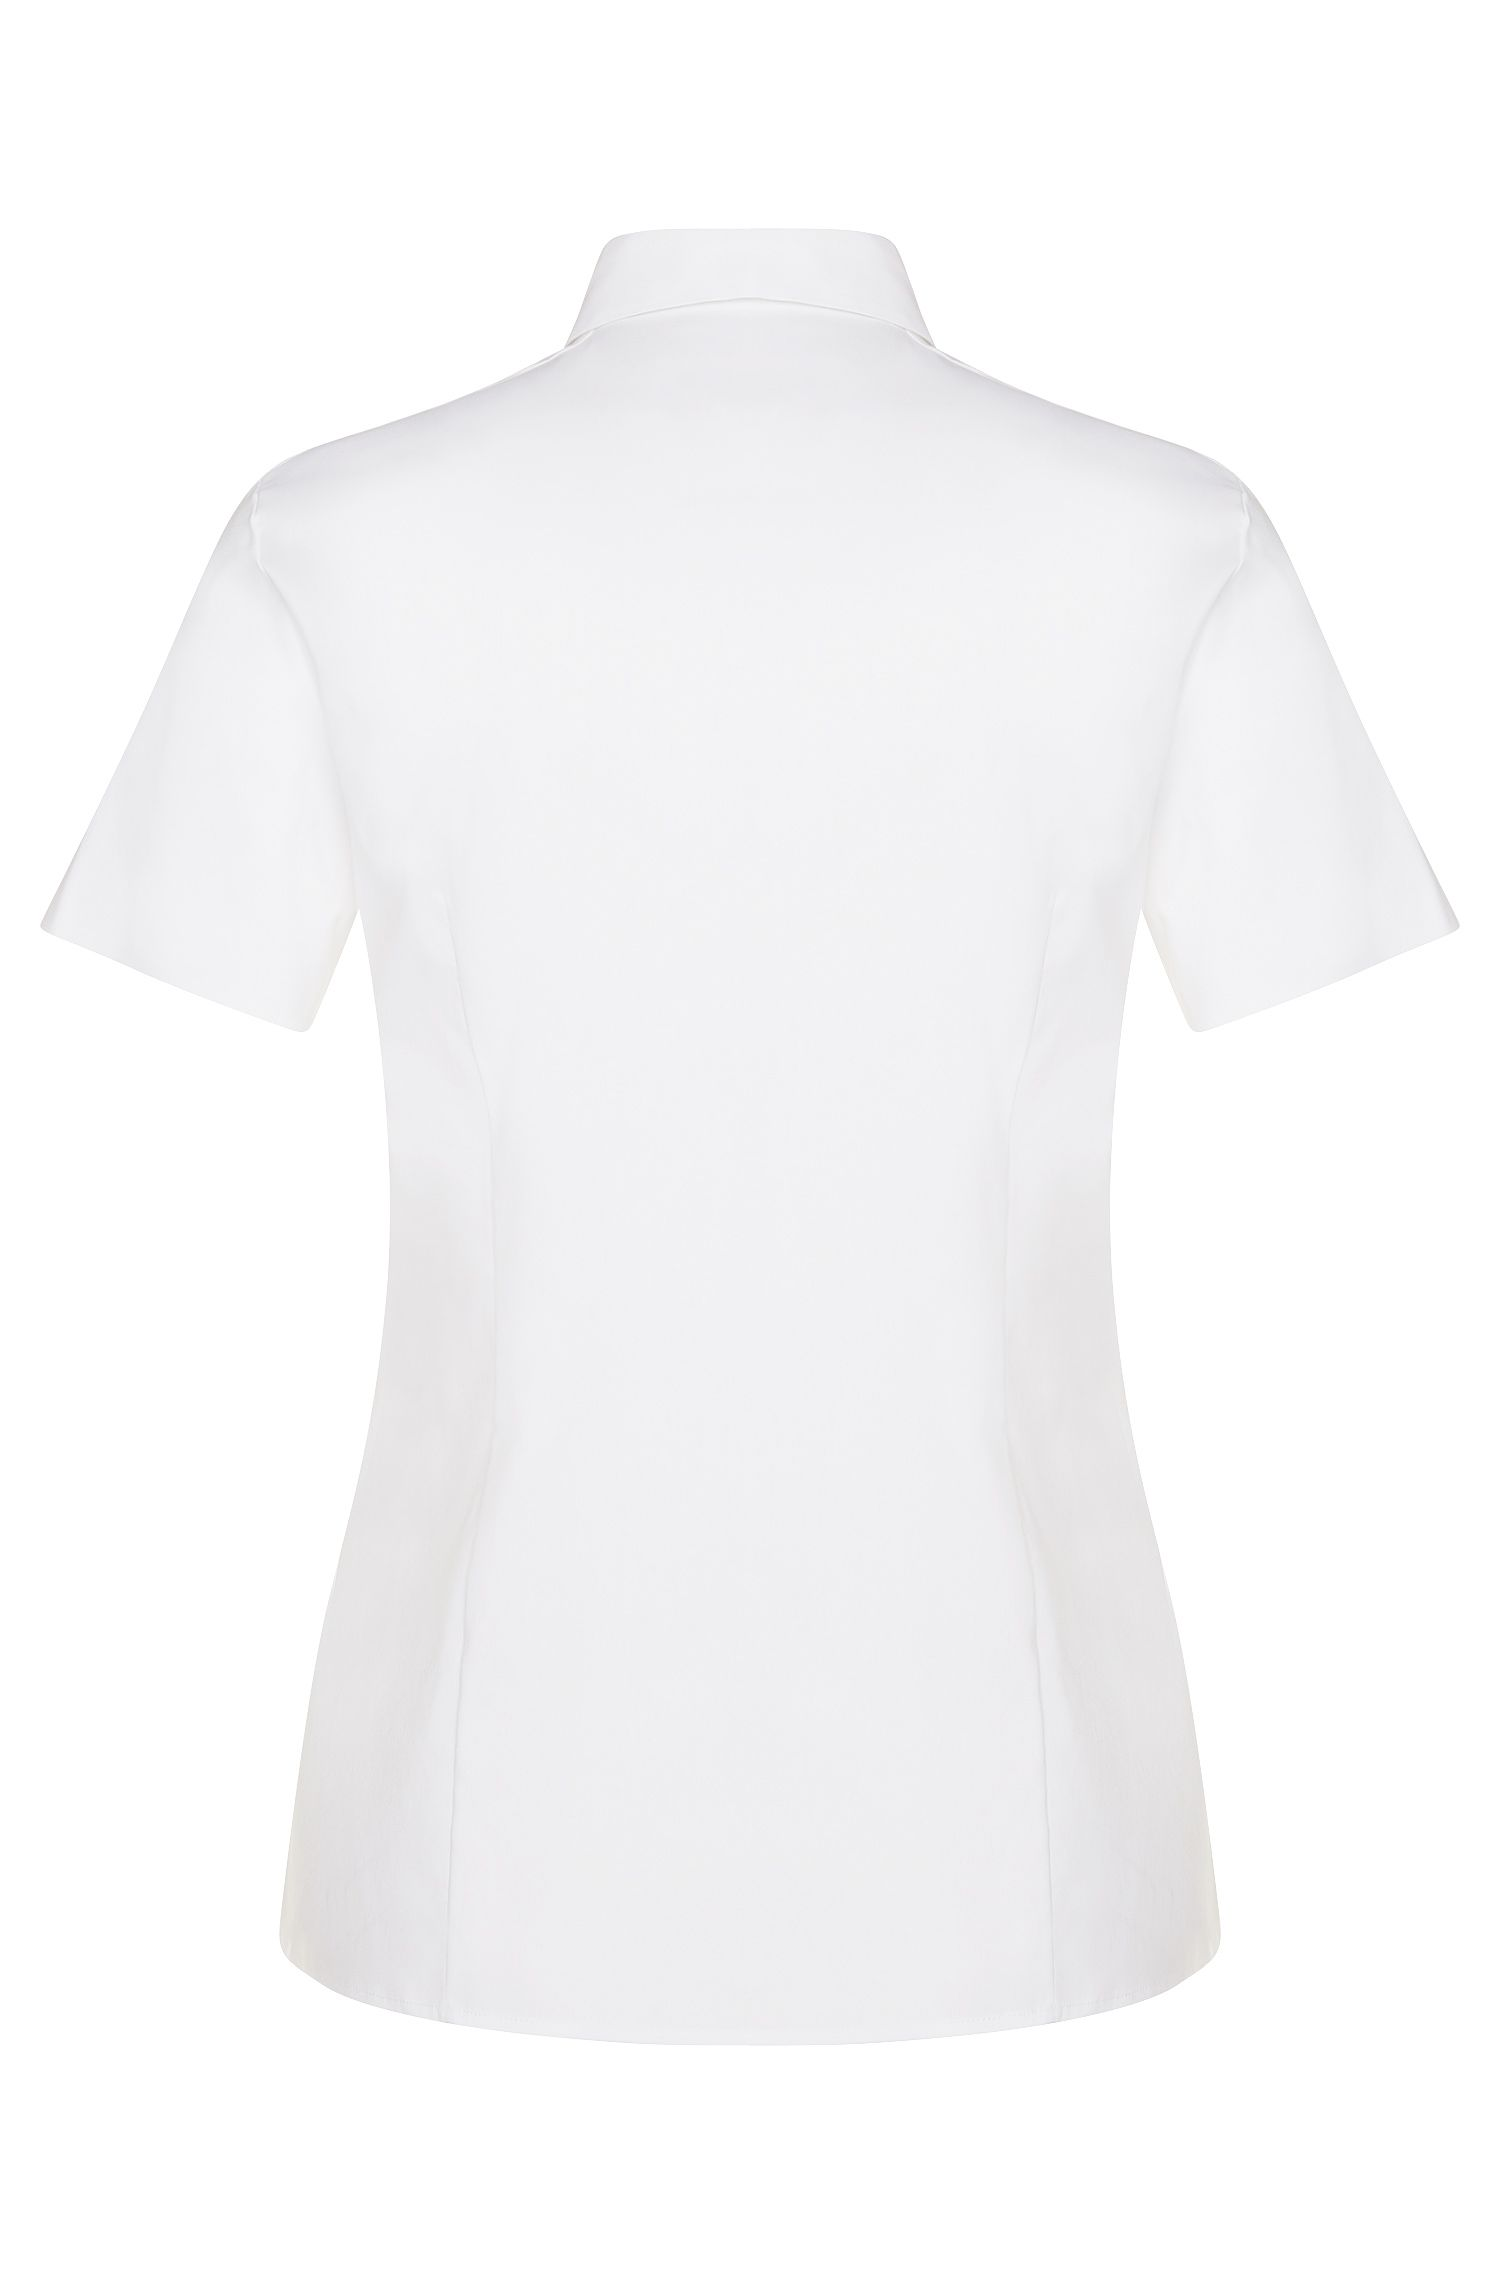 Standard-Fit Bluse aus Baumwoll-Mix: 'Baphina'